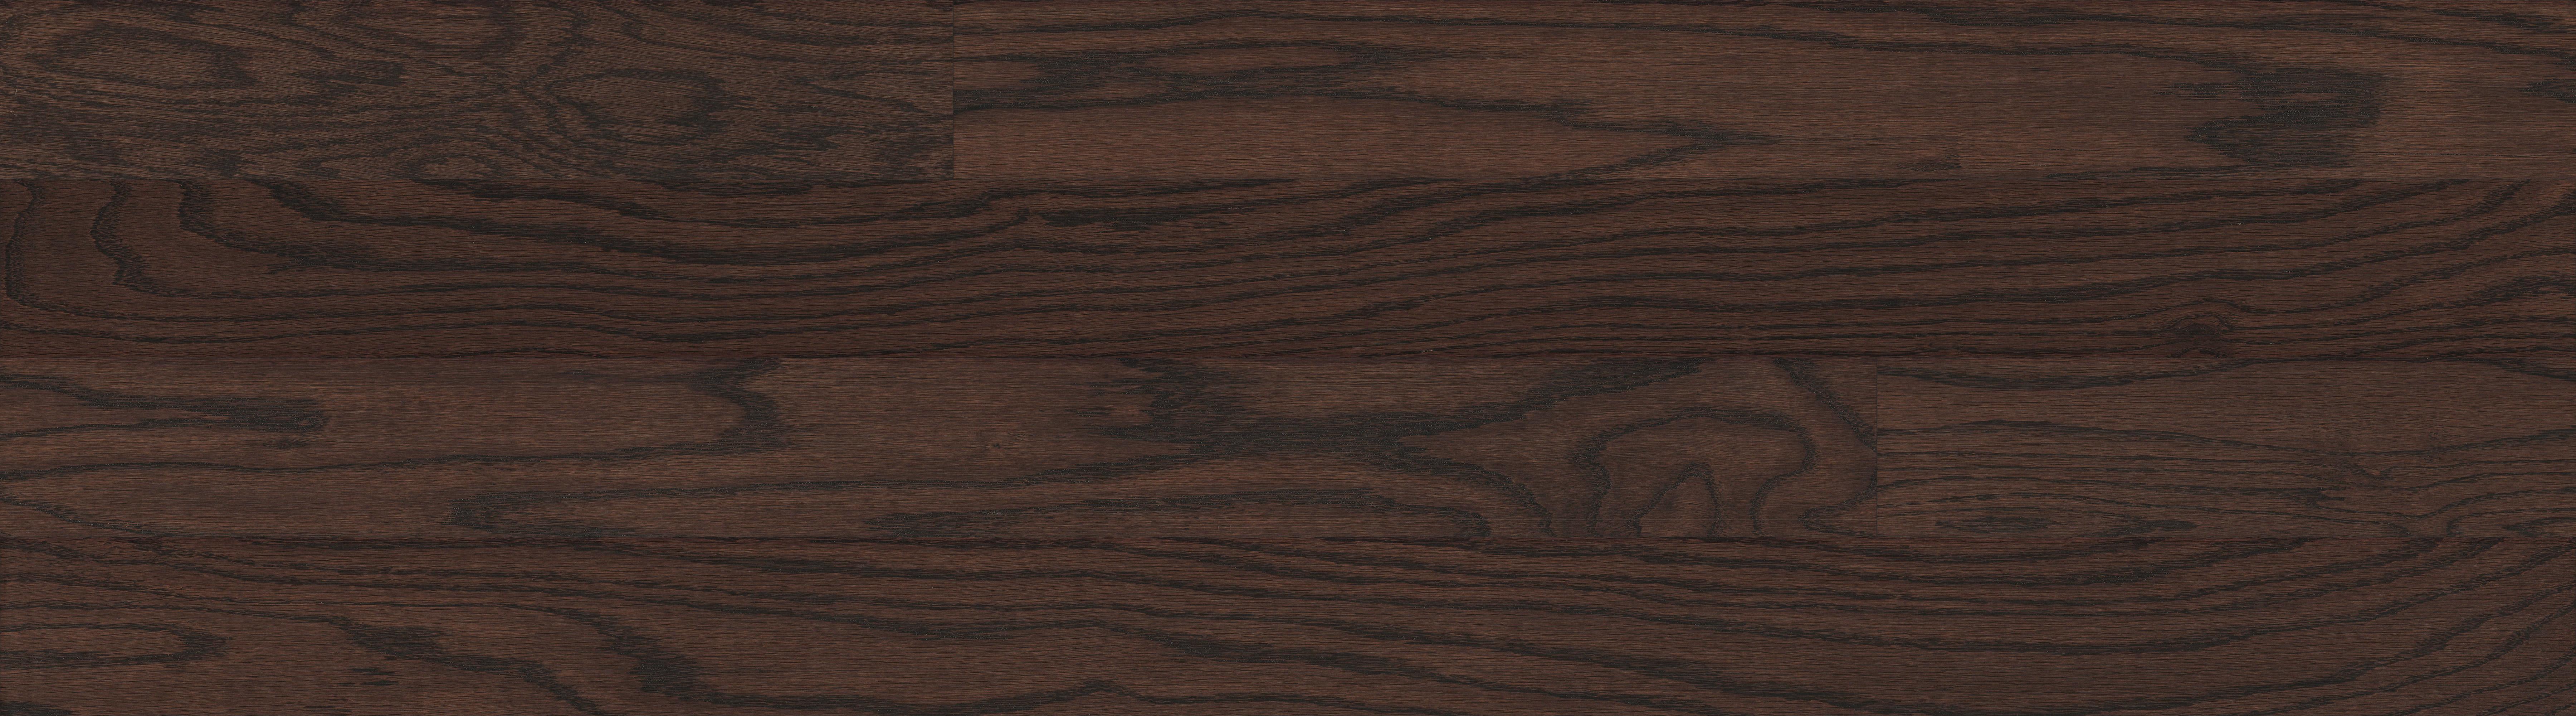 2 1 4 inch engineered hardwood flooring of mullican ridgecrest oak burnt umber 1 2 thick 5 wide engineered within mullican ridgecrest oak burnt umber 1 2 thick 5 wide engineered hardwood flooring